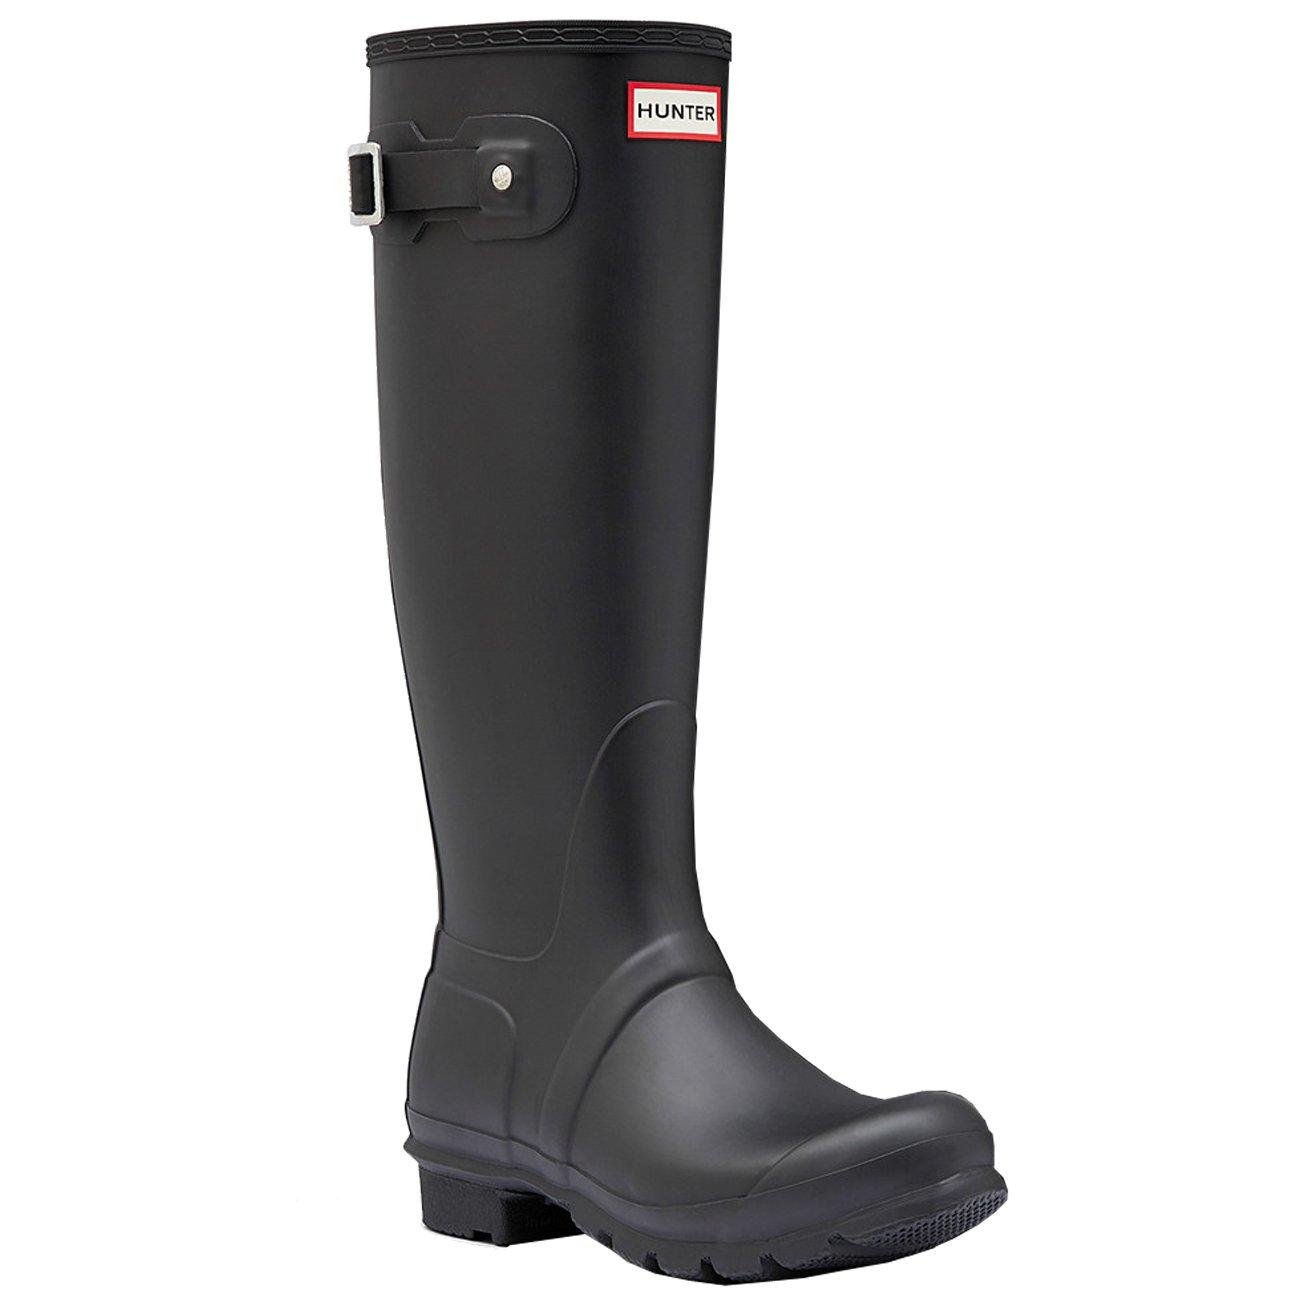 Amazon.com: Womens Hunter Original Tall Wellington Waterproof Winter Snow  Rain Boots: Shoes